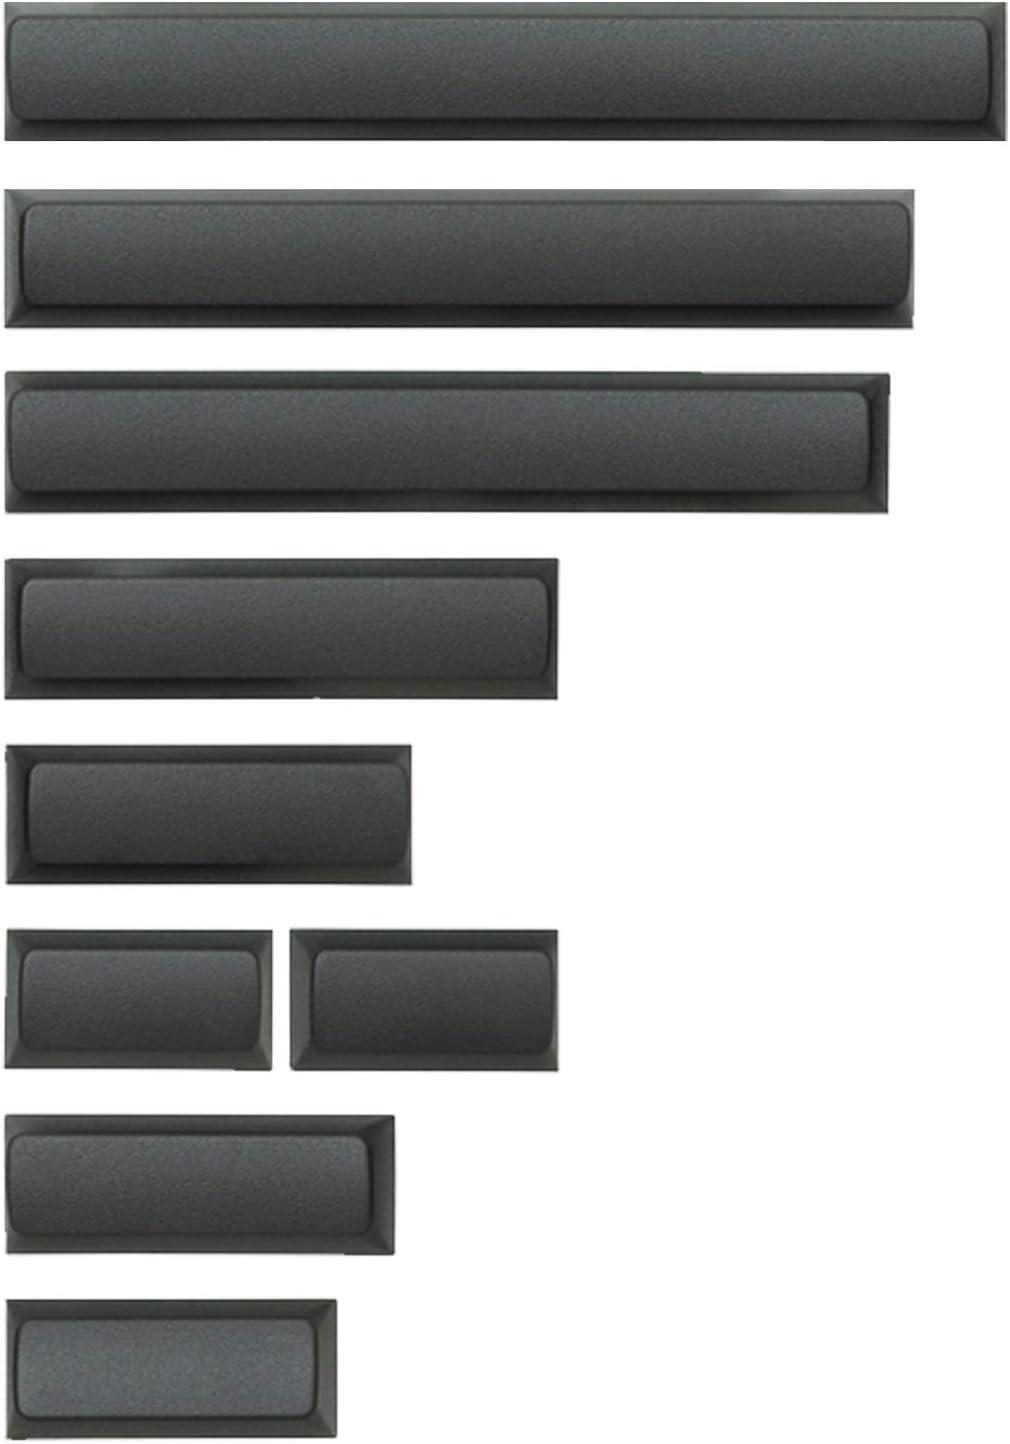 Drop + Matt3o MT3 Susuwatari Doubleshot ABS Keycap Set - Spacebars